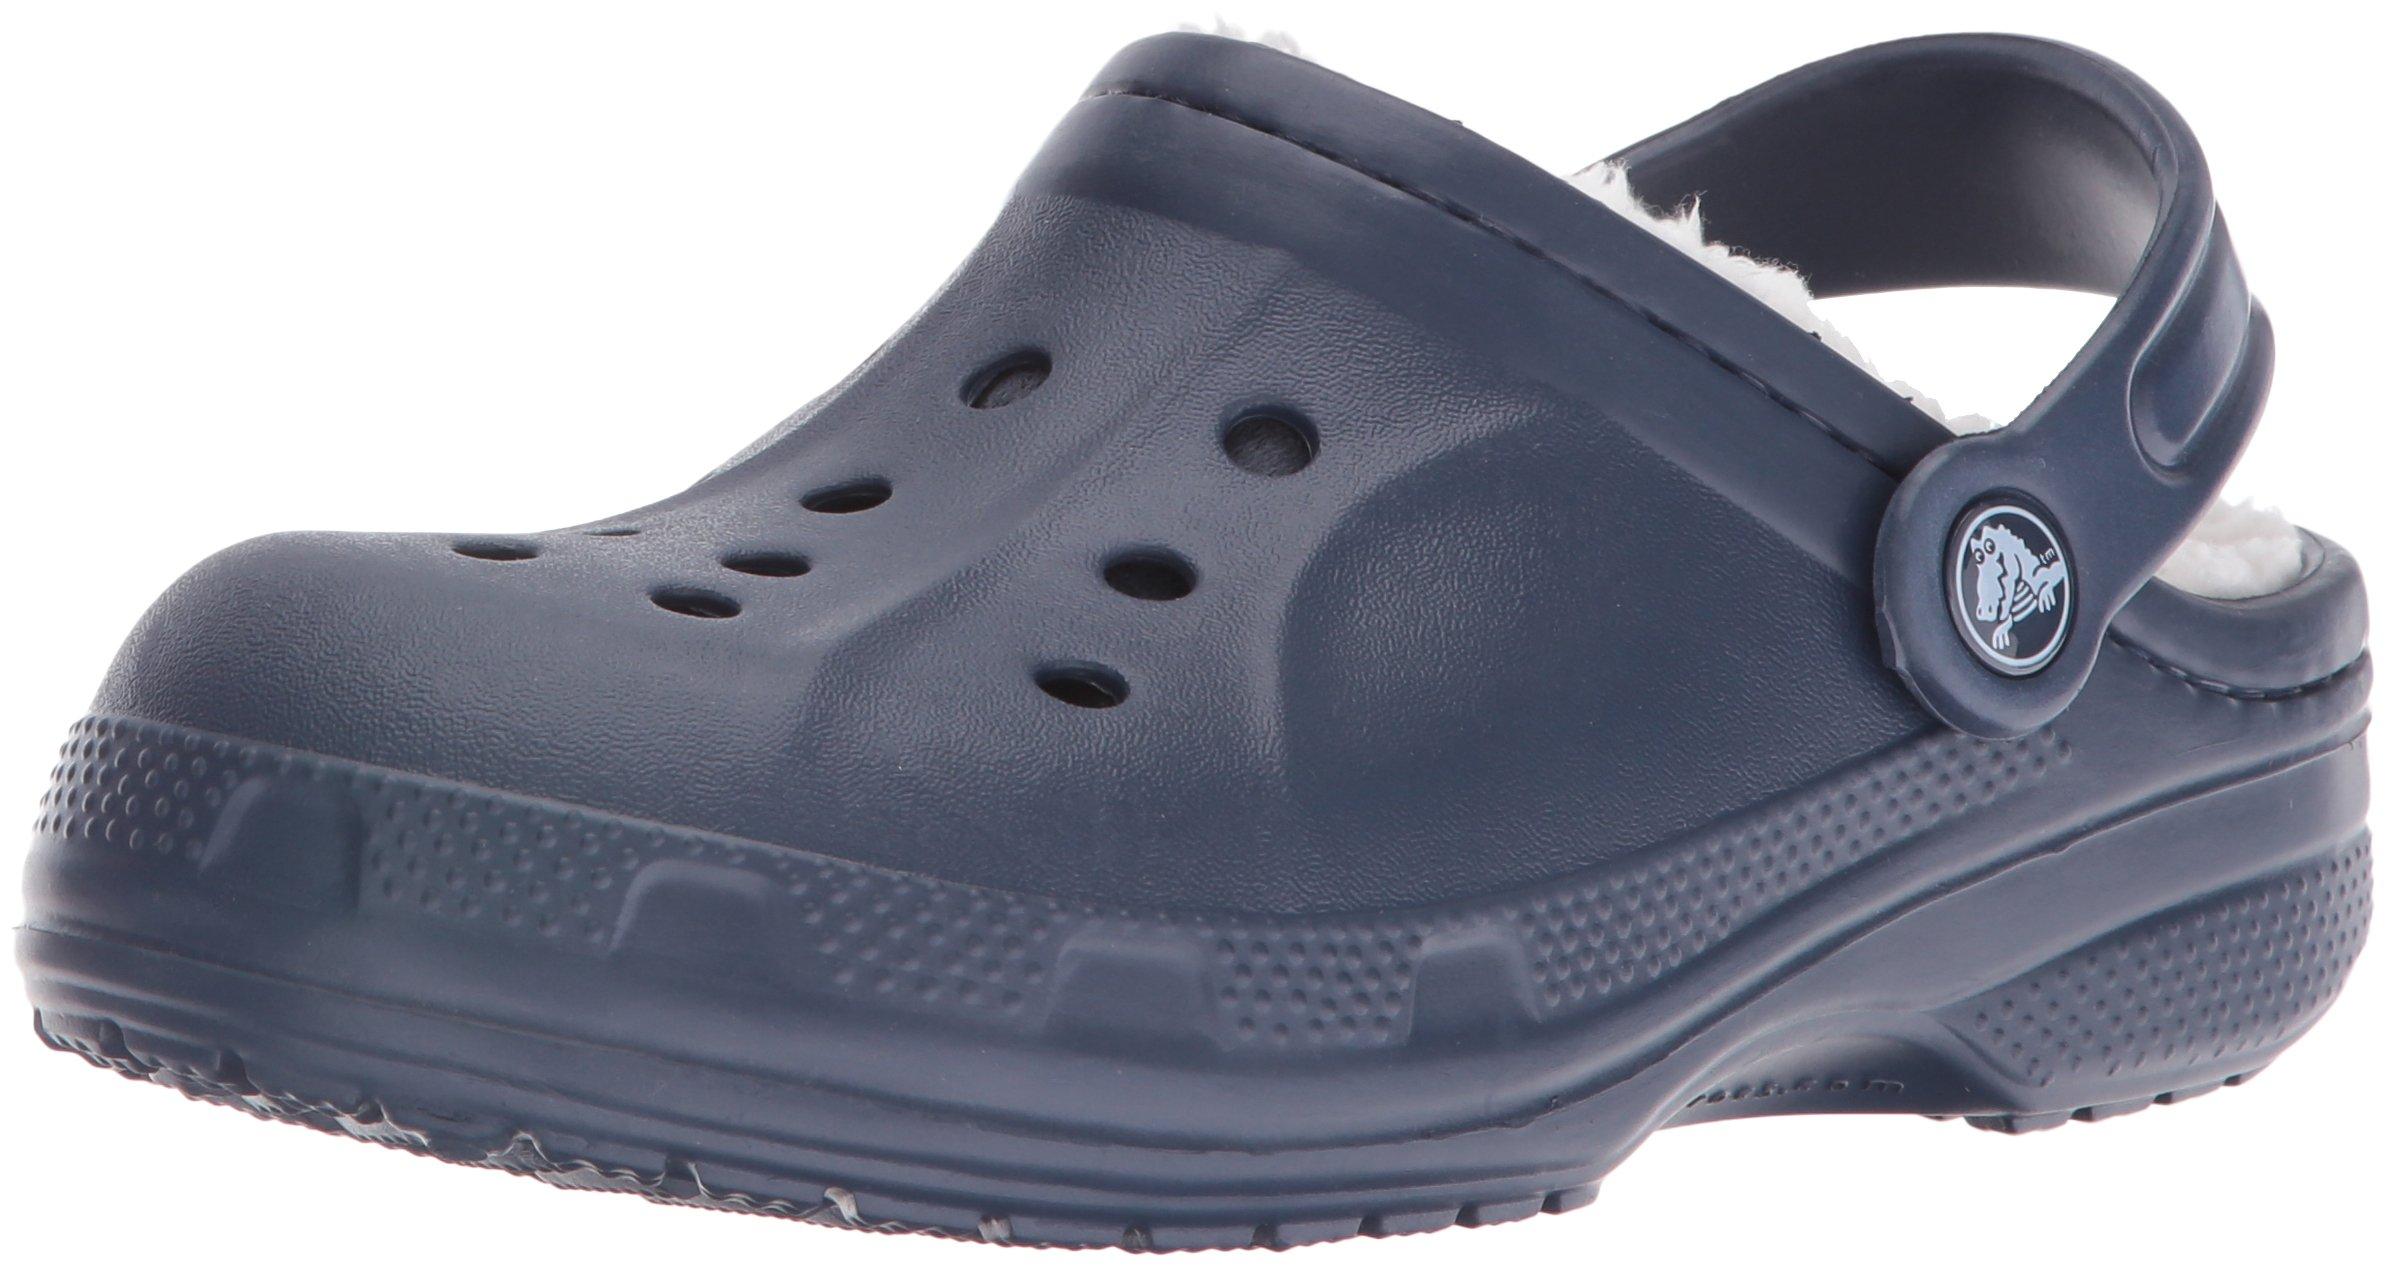 crocs Winter Clog (Toddler/Little Kid), Navy/Oatmeal, 3 M US Little Kid by Crocs